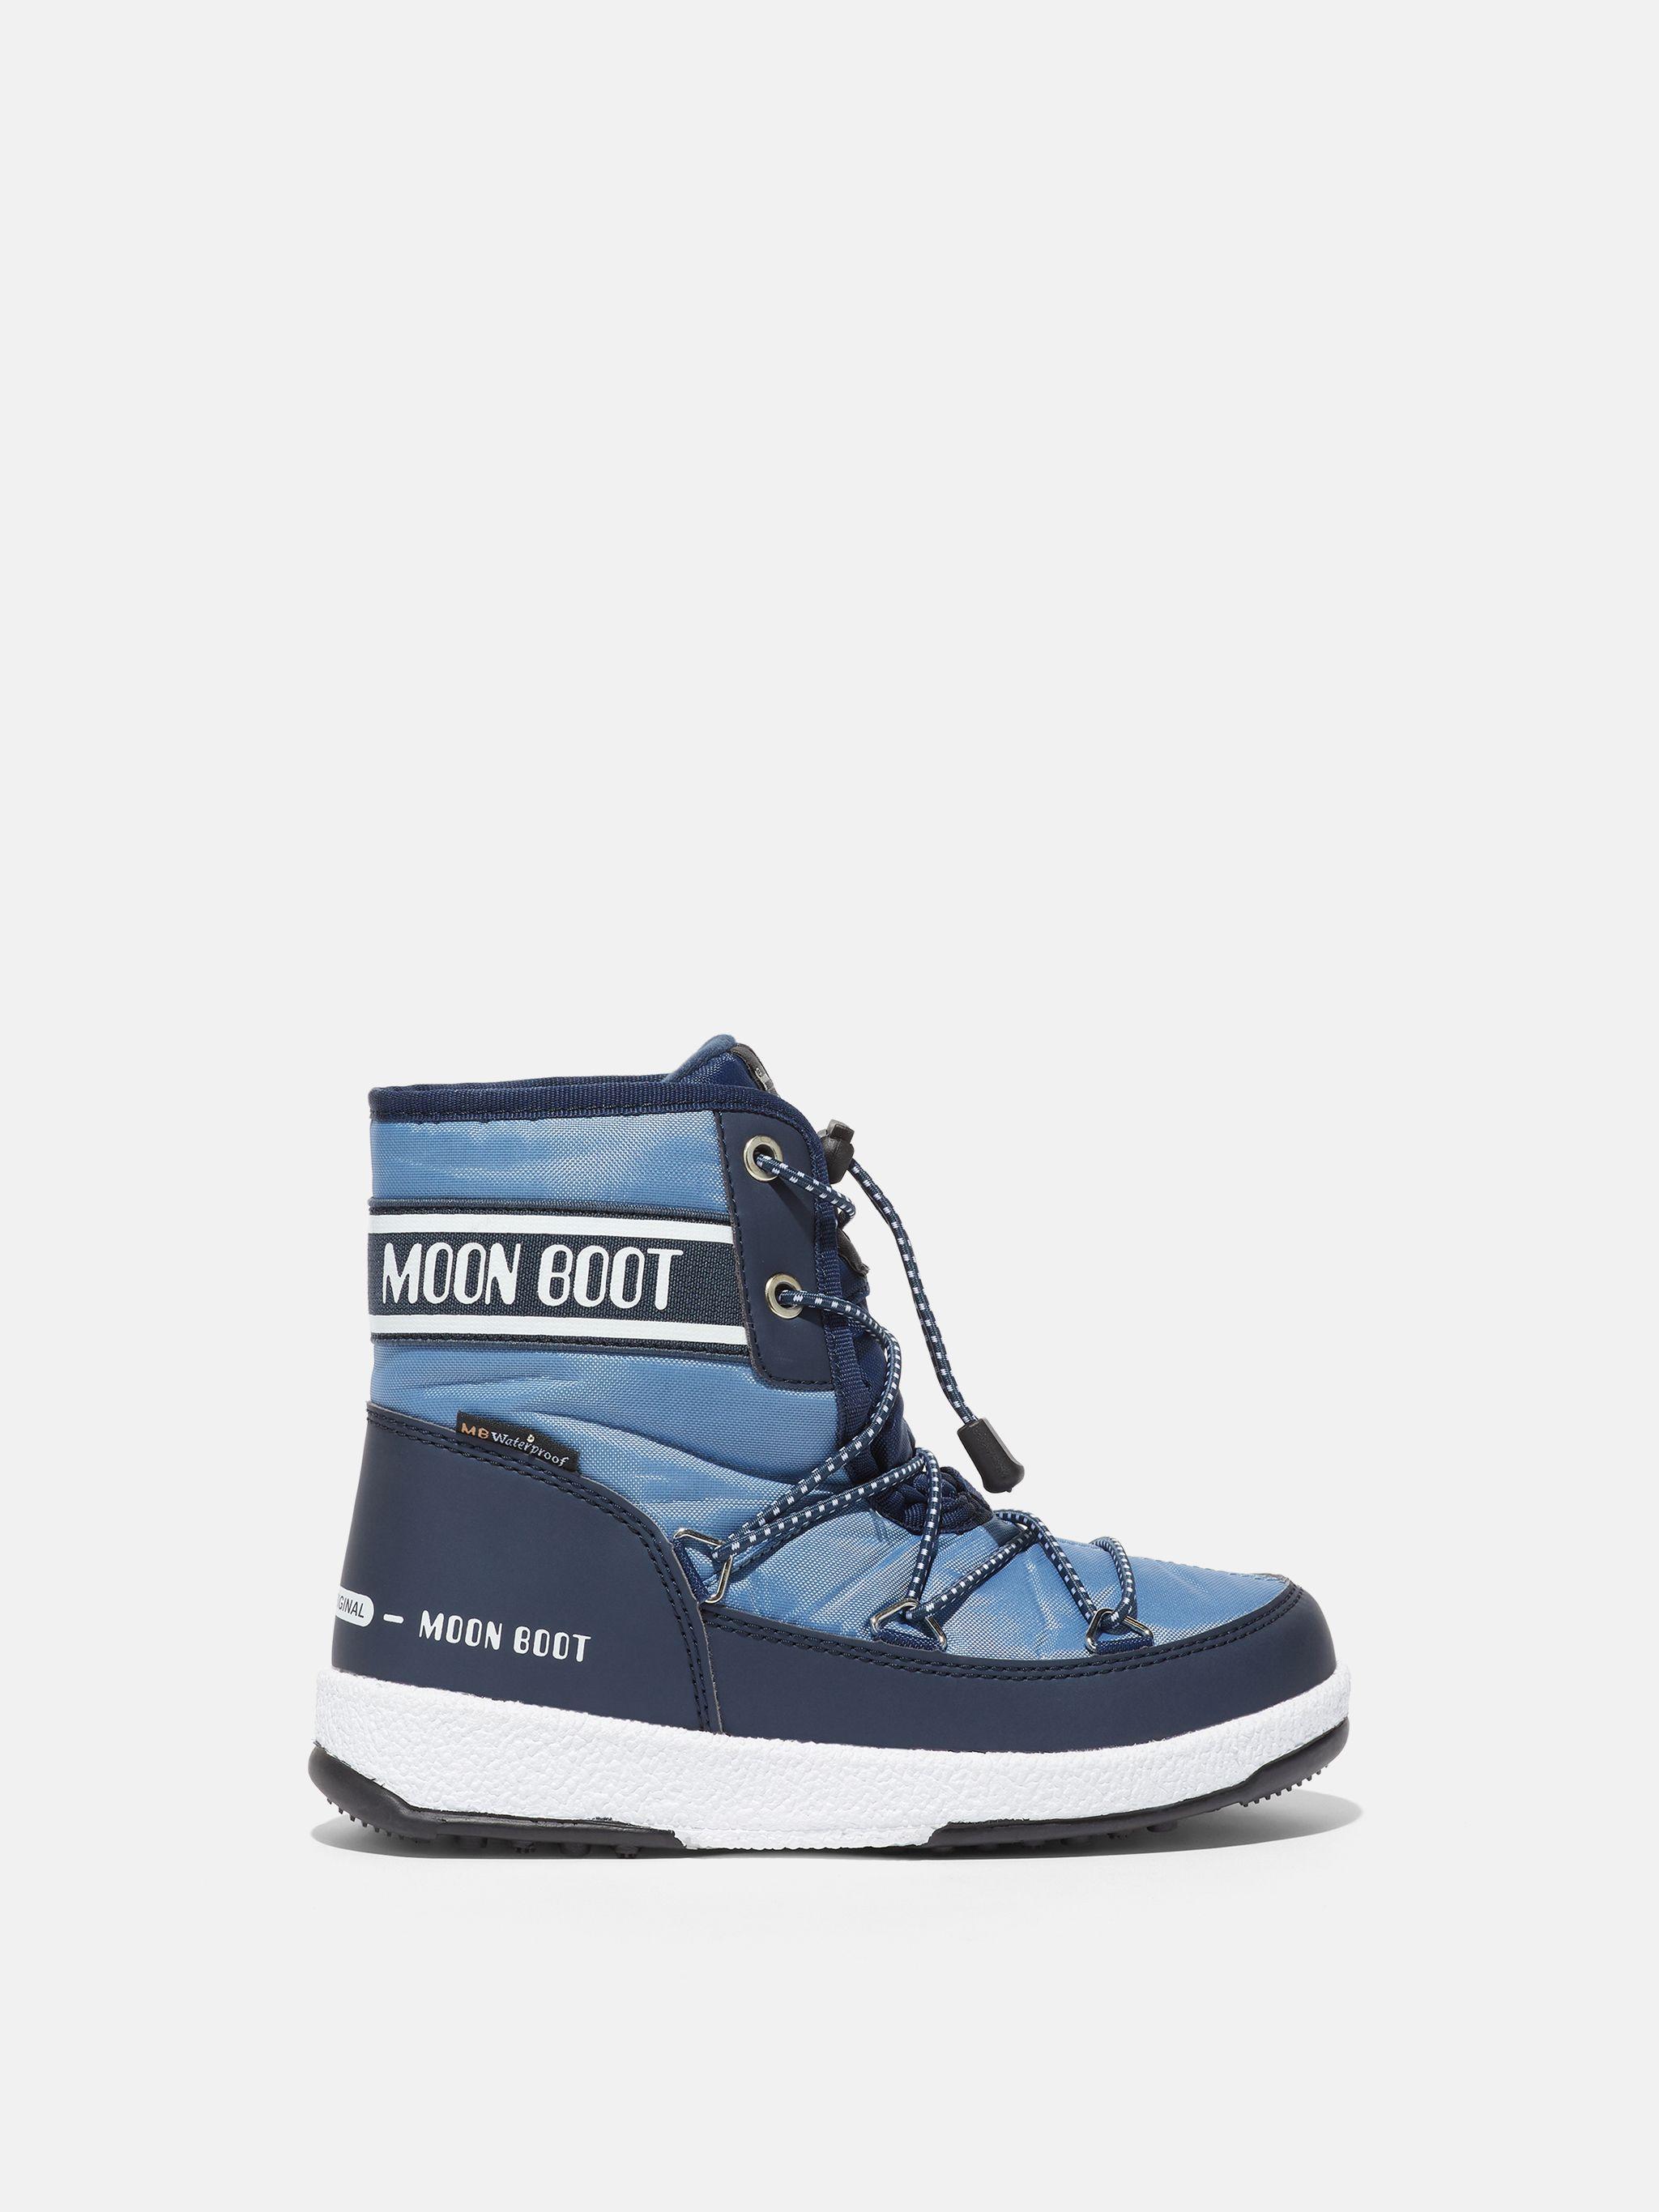 PROTECHT JUNIOR MID BLUE NYLON BOOTS